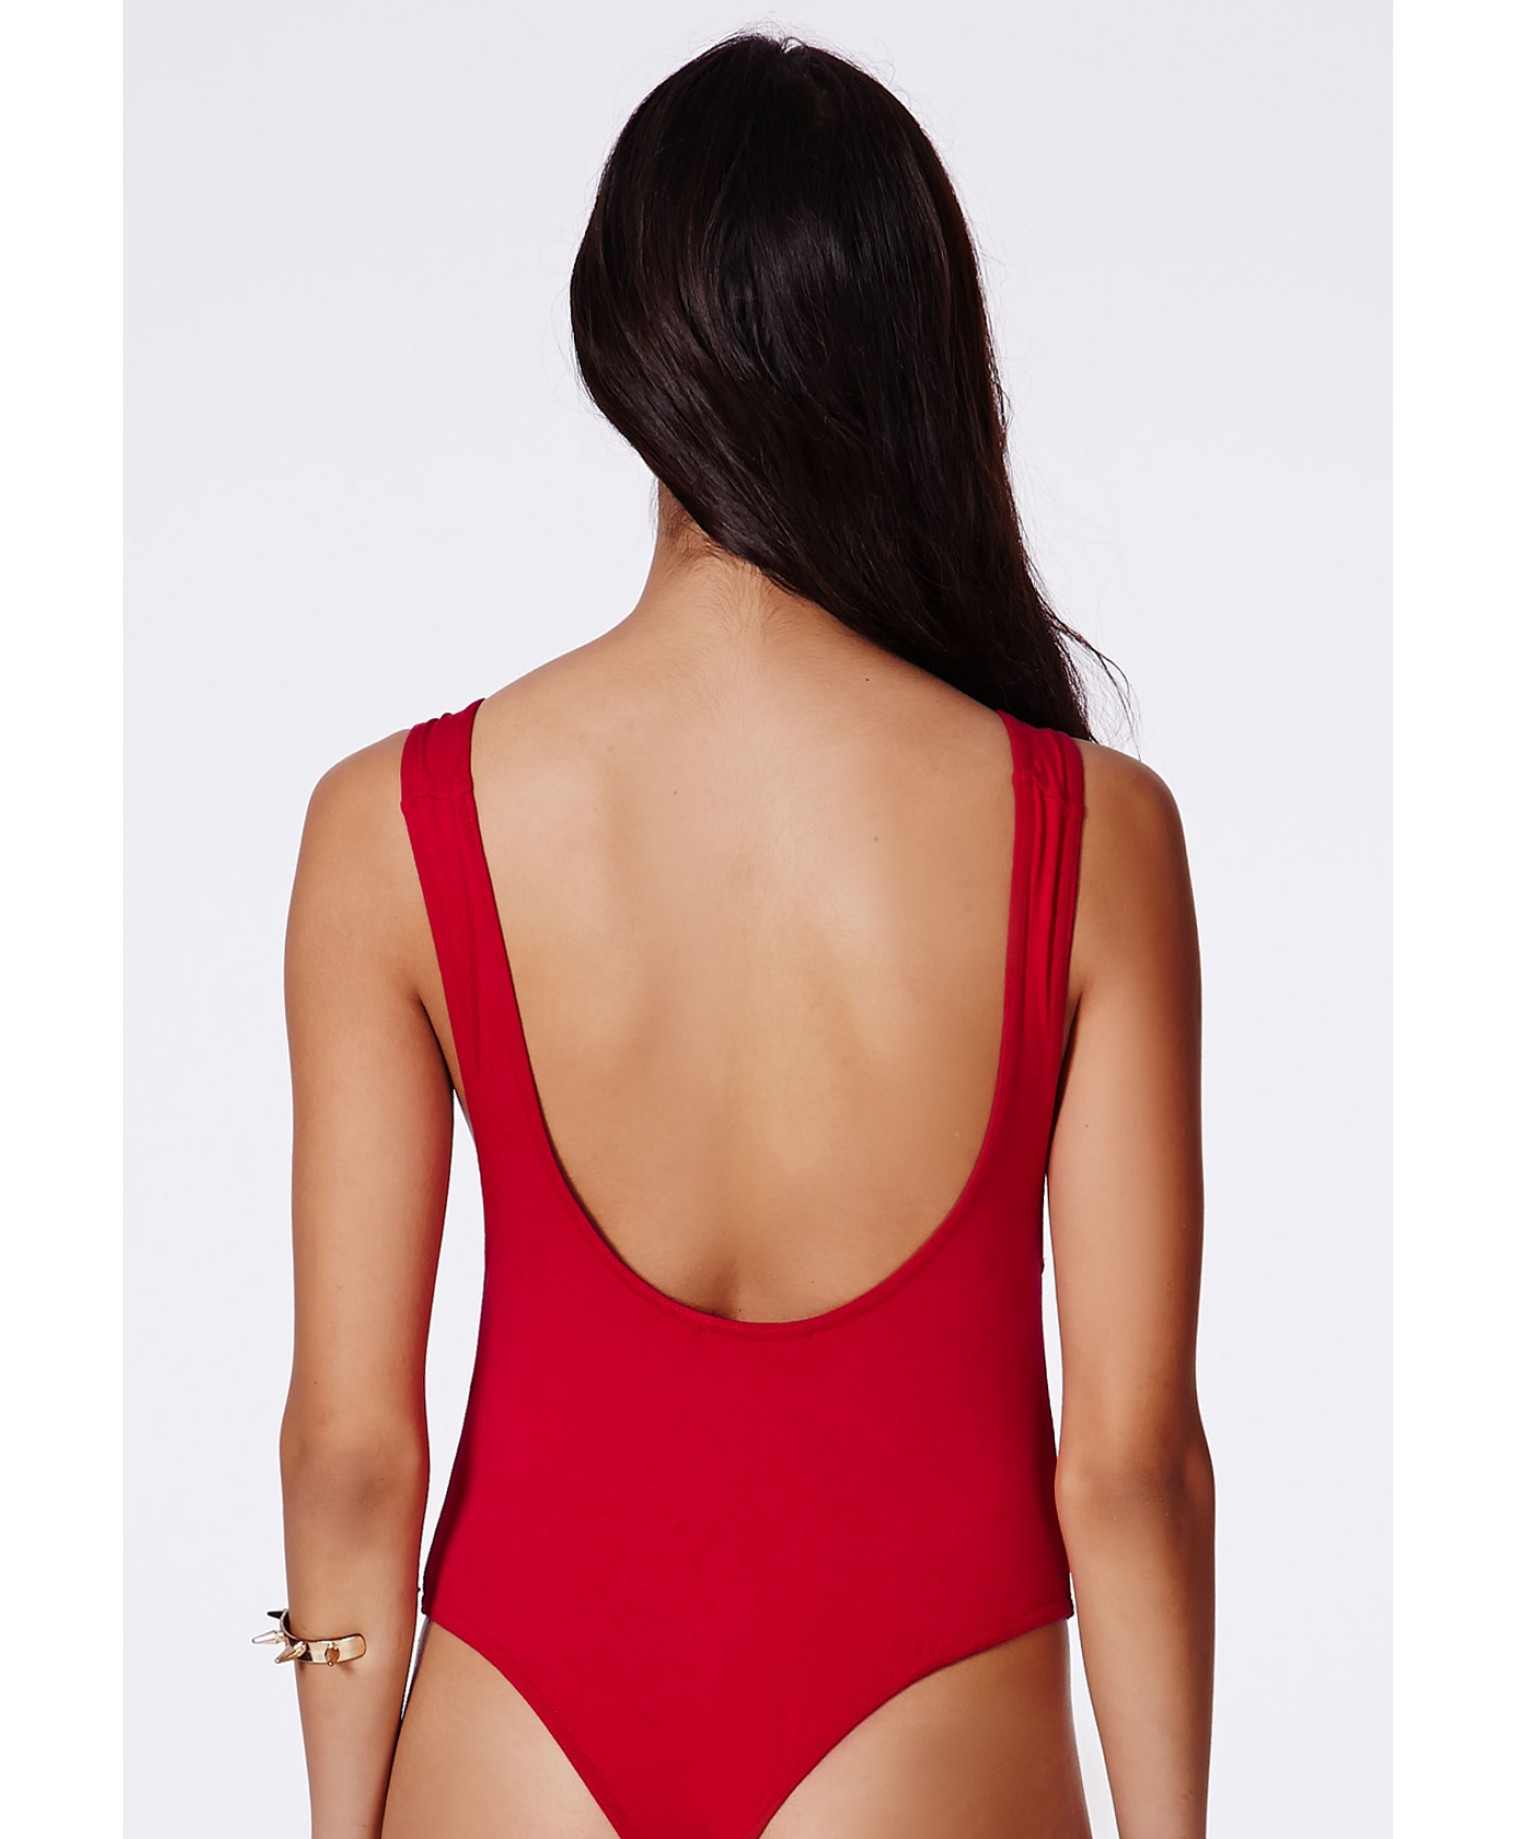 e422b9b9b66a Missguided Ryska Lifeguard Backless Thong Bodysuit Campaign in Red ...